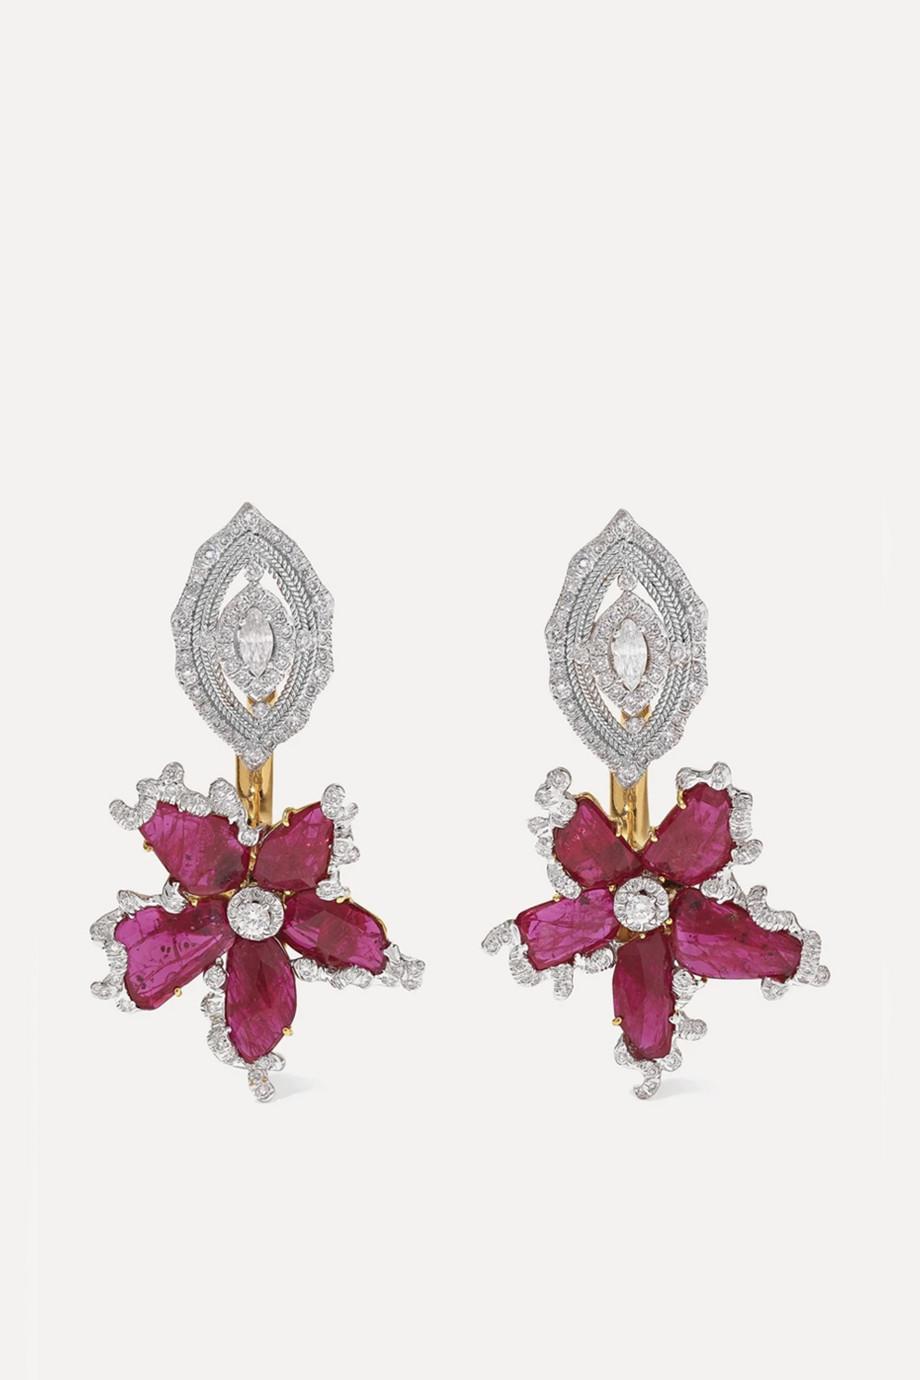 Bina Goenka Ohrringe aus 18 Karat Gold mit Rubinen und Diamanten